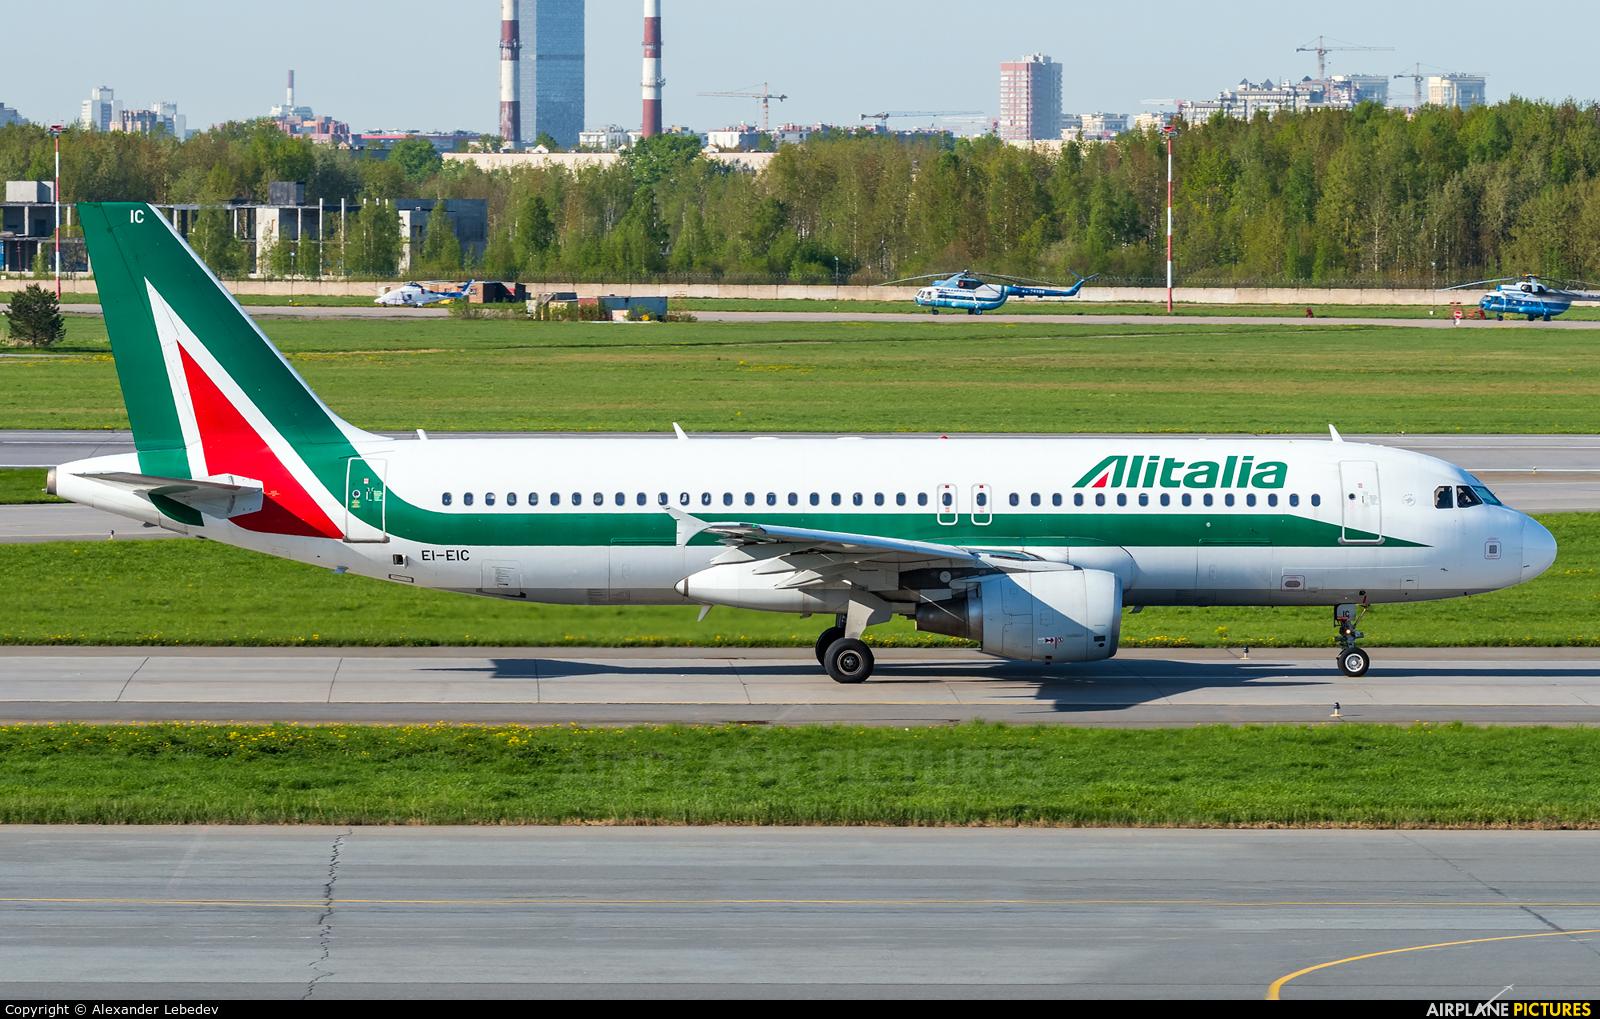 Alitalia EI-EIC aircraft at St. Petersburg - Pulkovo